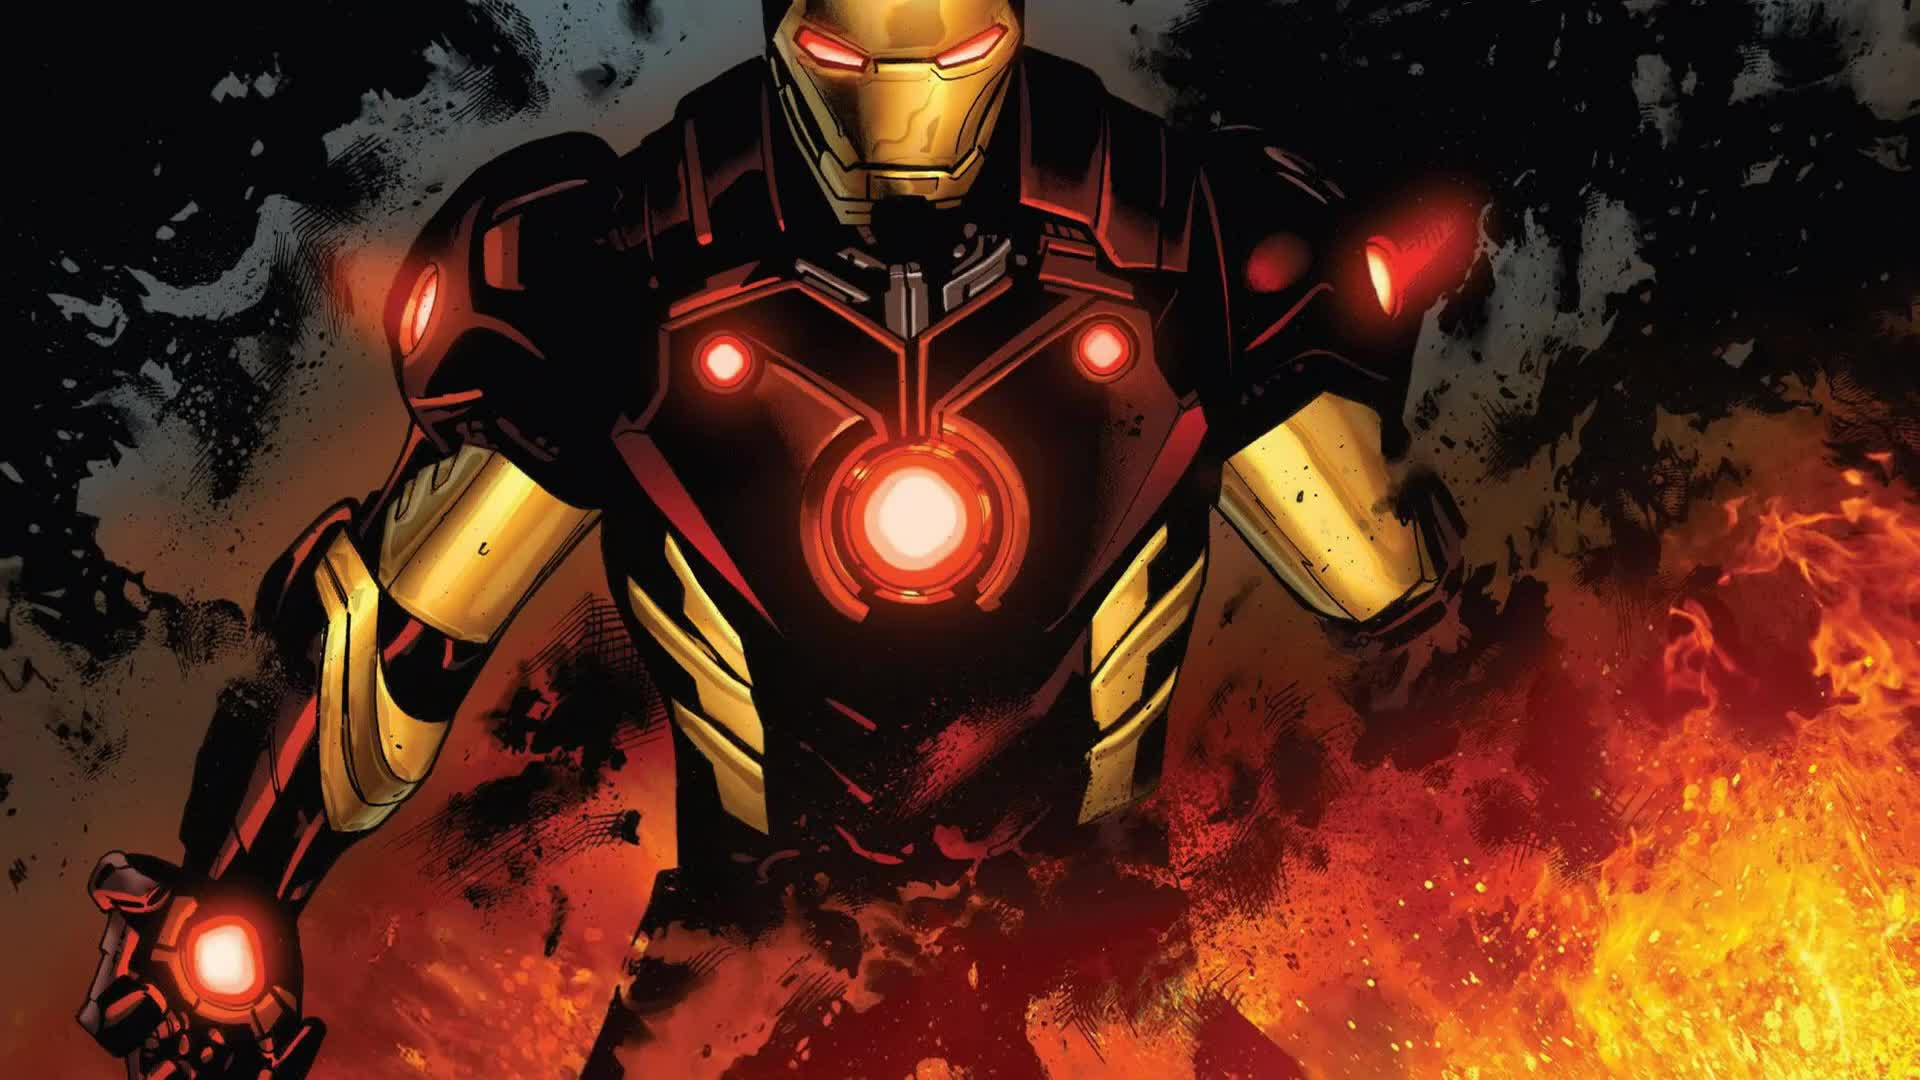 Iron Man Marvel DC Comics Artwork - Animated Live ...